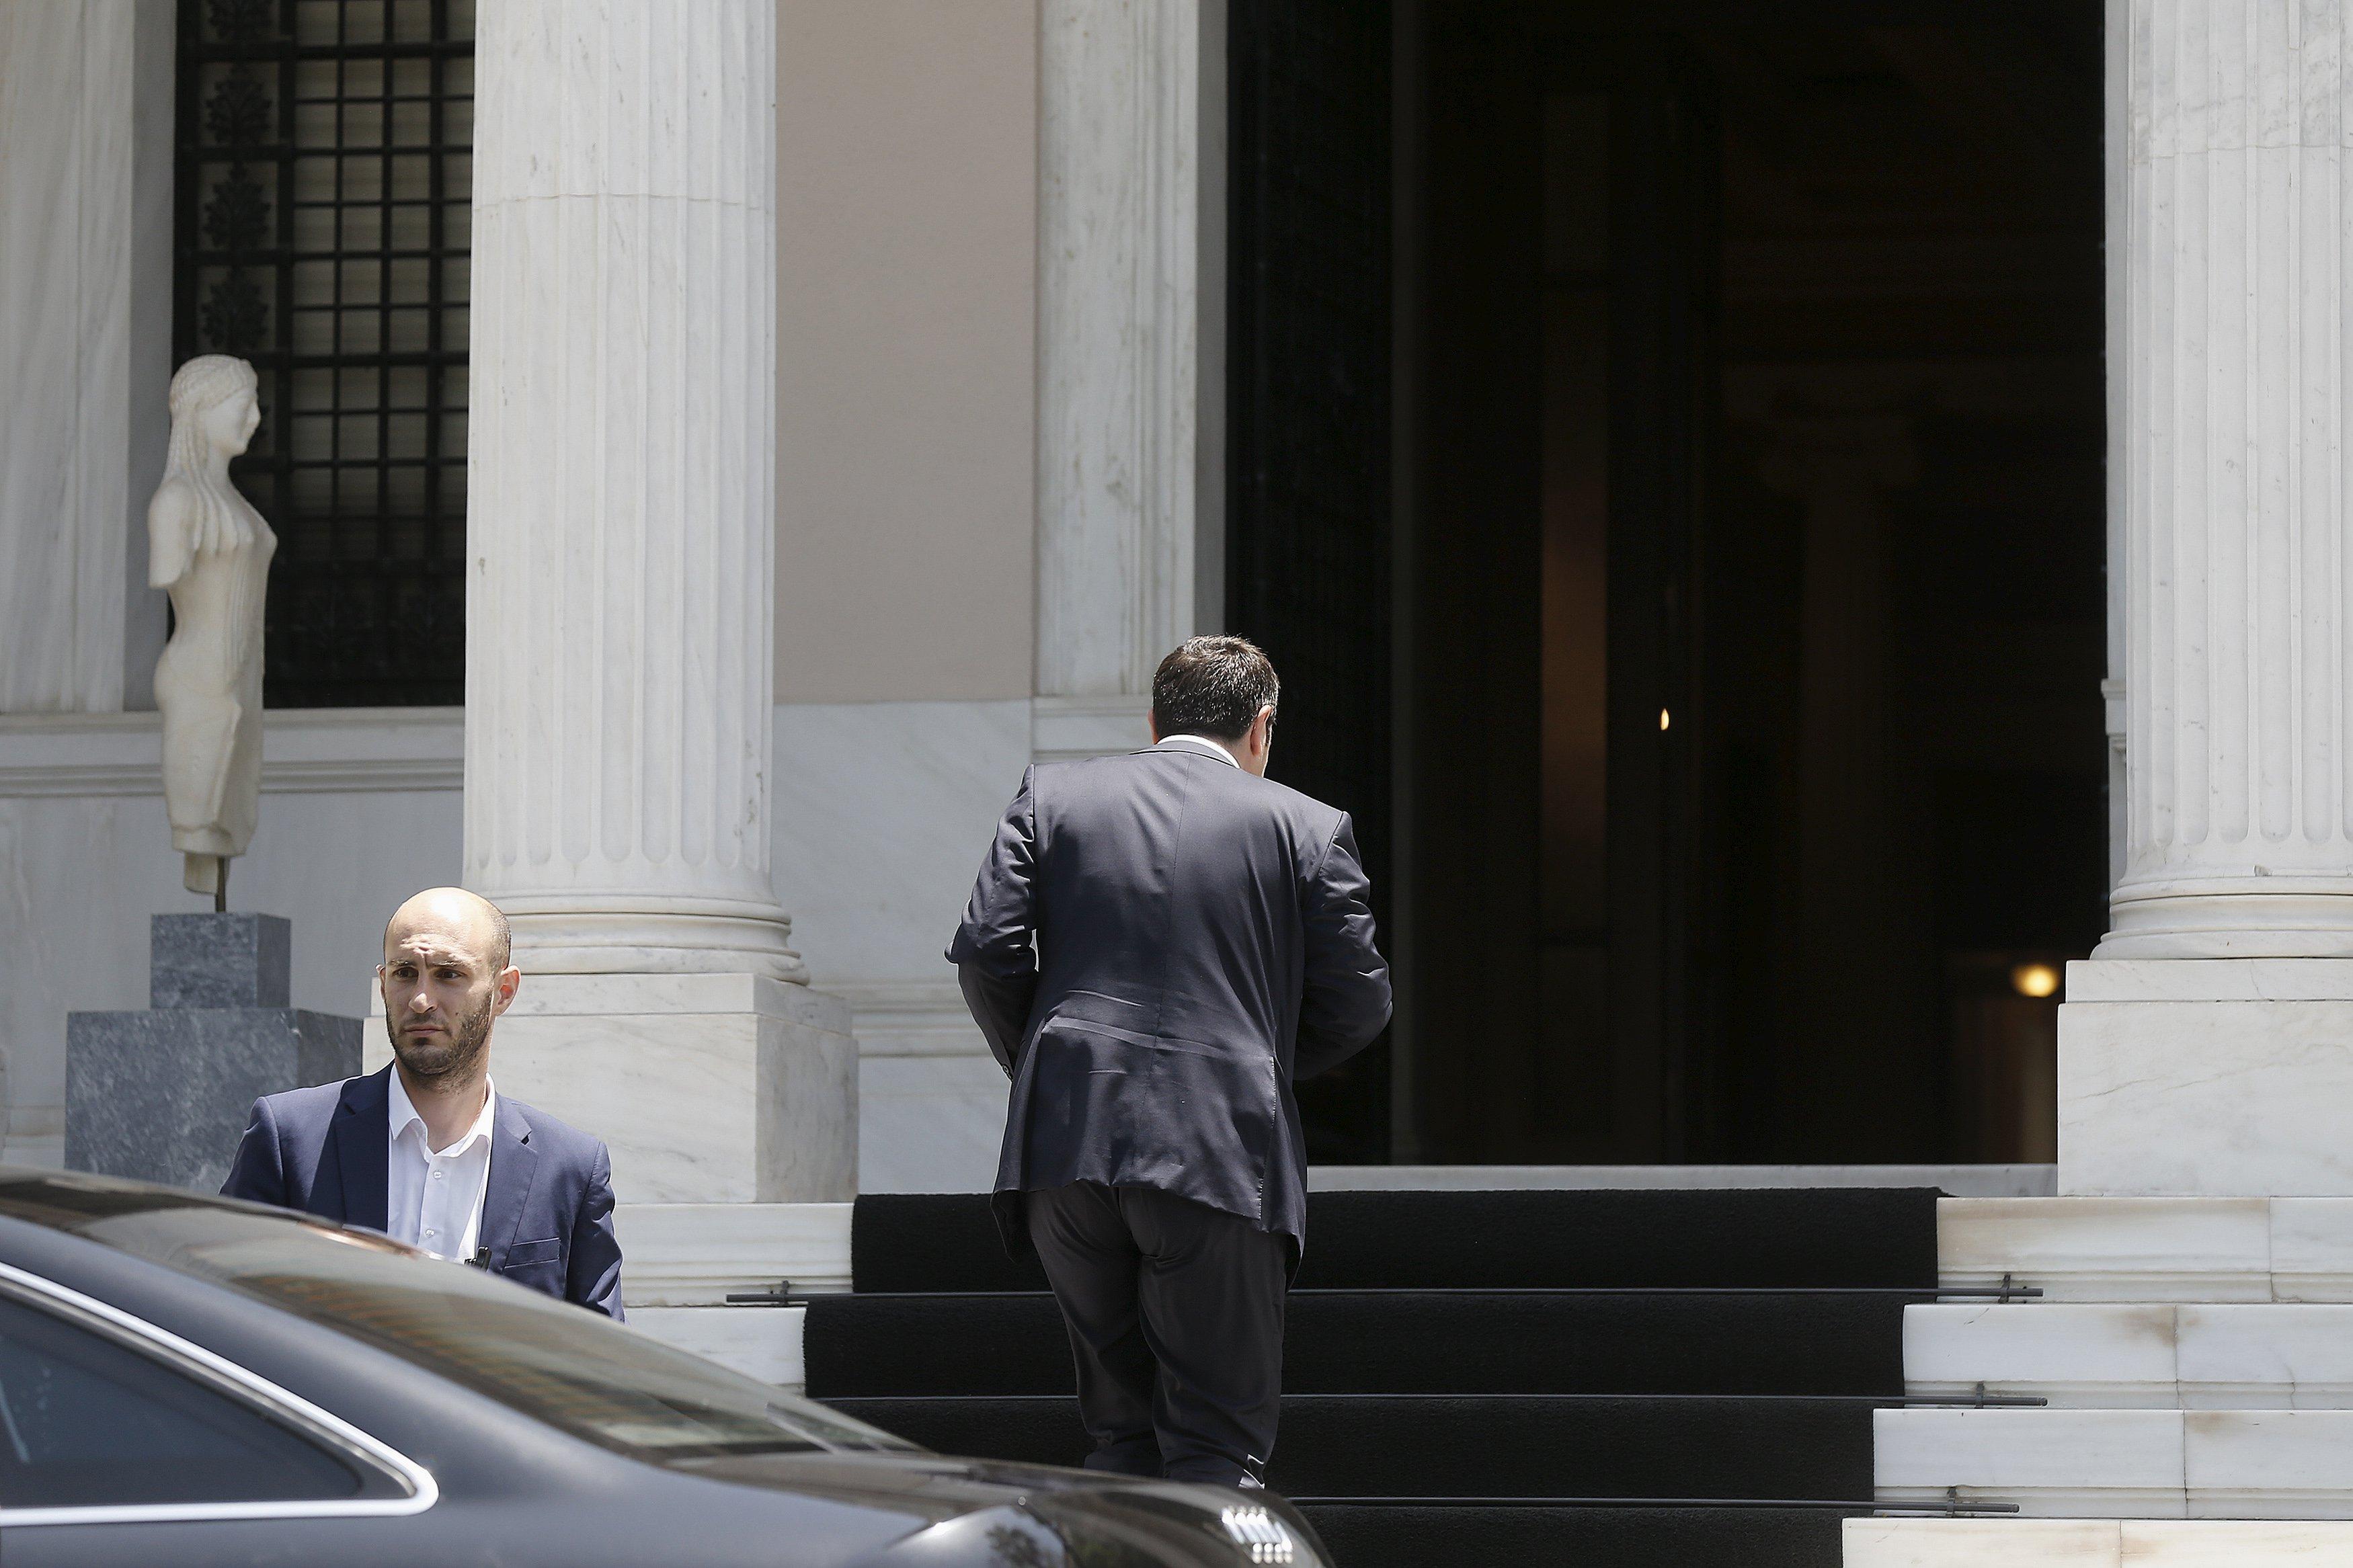 https://i0.wp.com/media.zenfs.com/en_us/News/Reuters/2015-06-15T121824Z_1006950001_LYNXMPEB5E0K5_RTROPTP_4_CBUSINESS-US-EUROZONE-GREECE.JPG